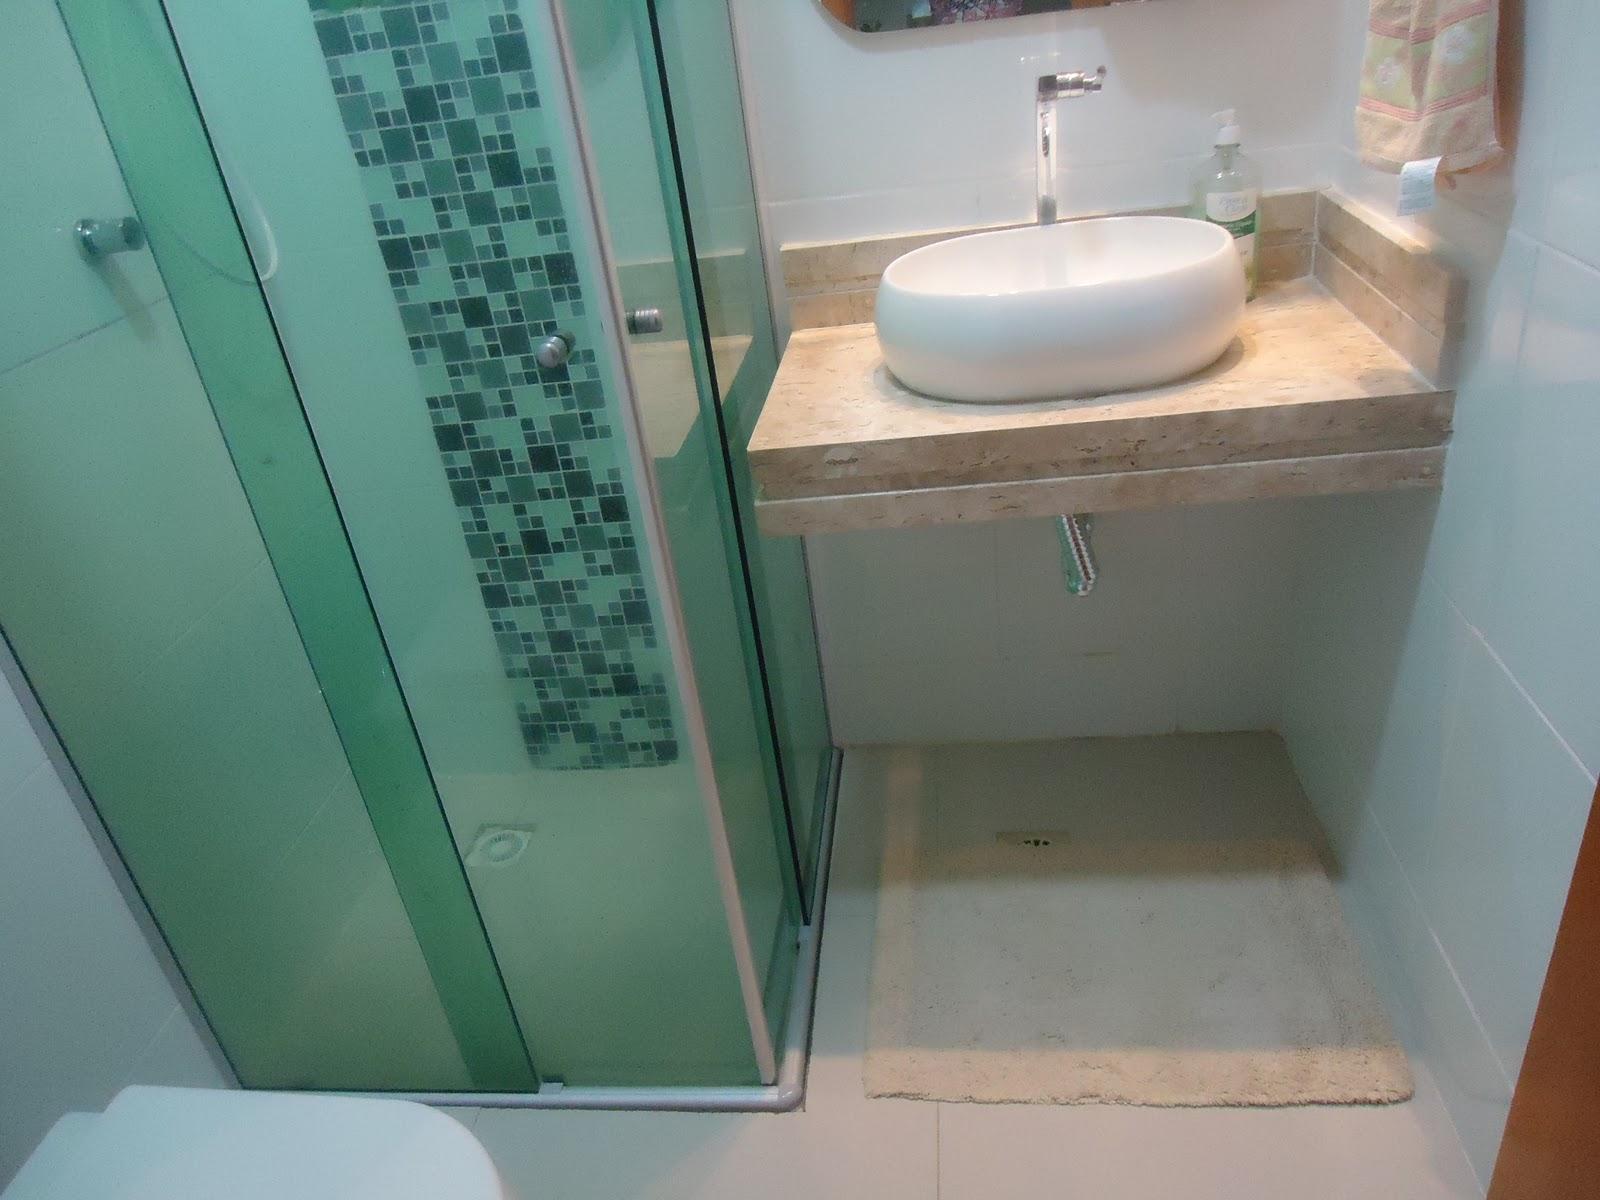 Torneira Docol Stilo/ Cuba apoio Alfa Scalline branca/Pedra Bege Bahia #68402A 1600x1200 Banheiro Container Bahia